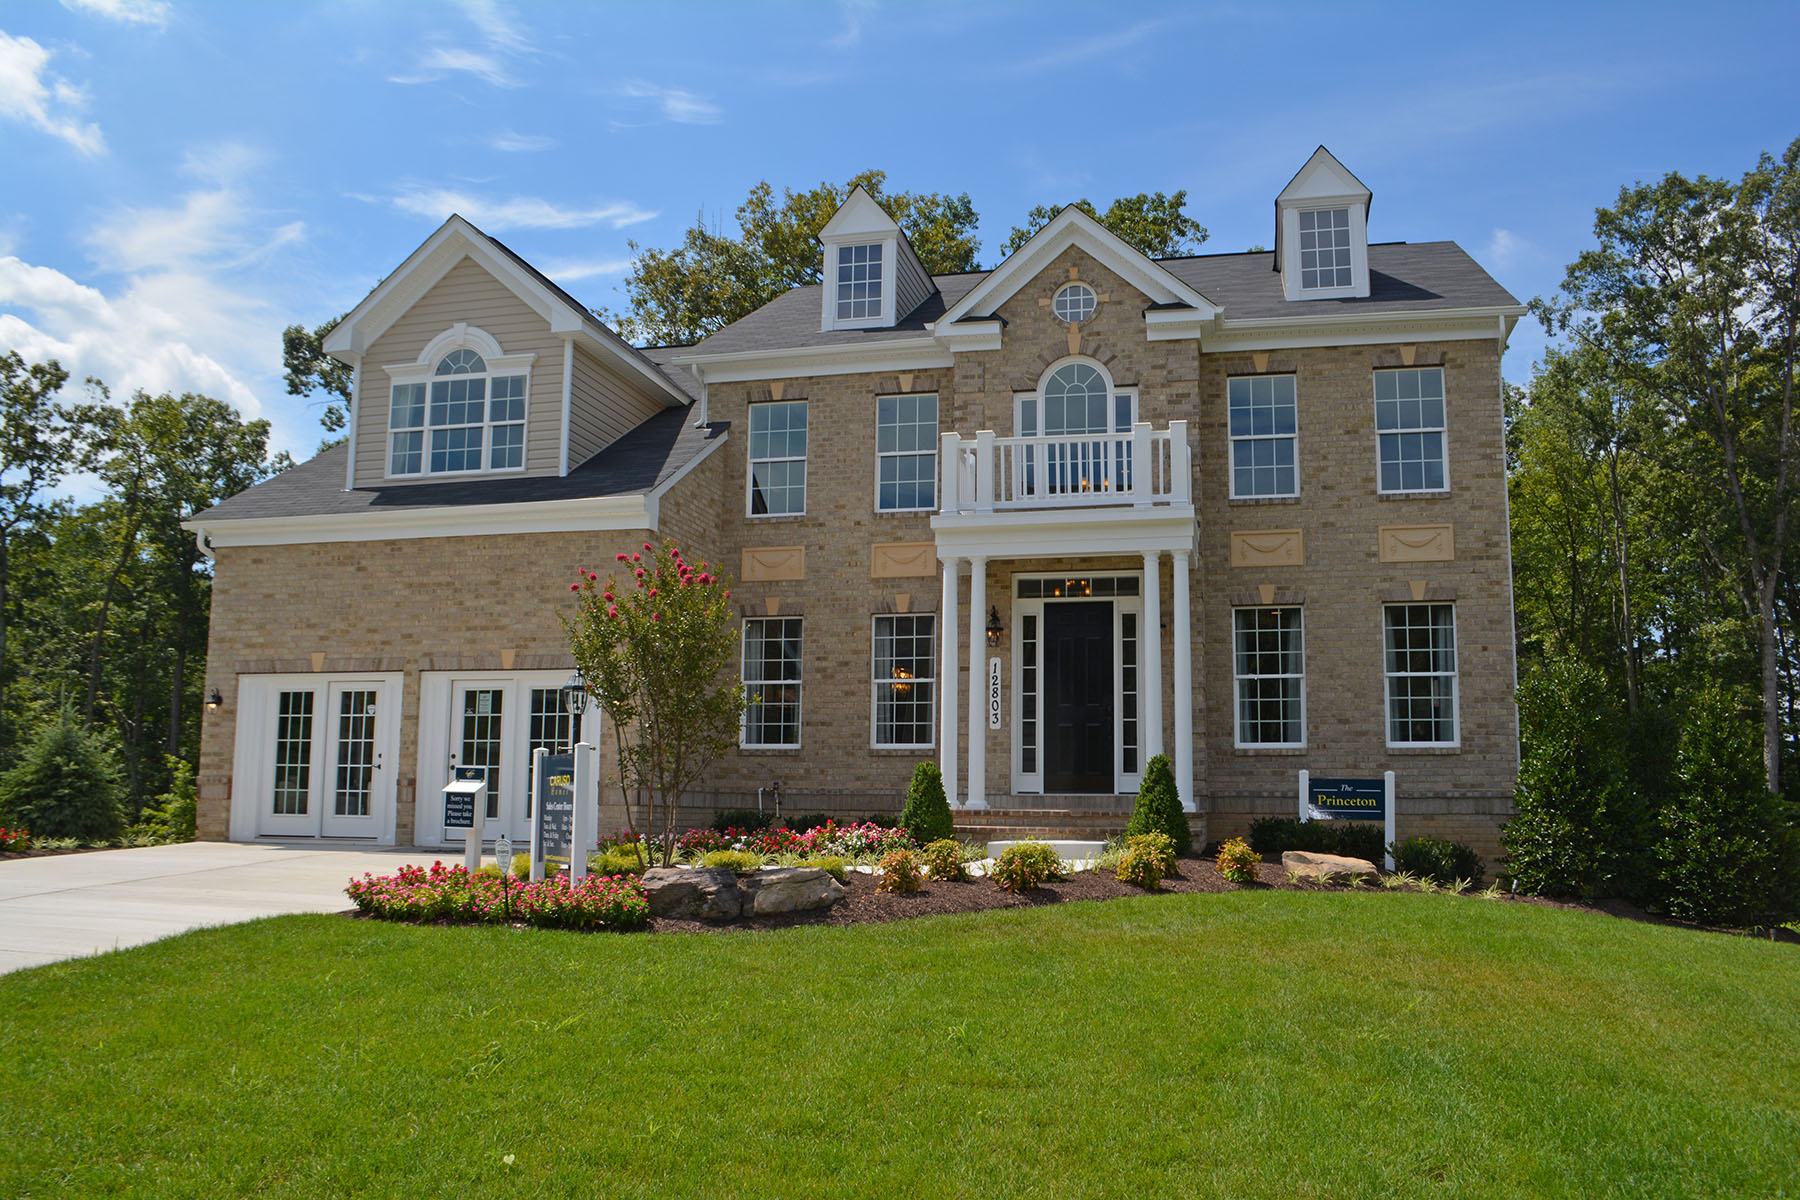 Single Family for Sale at Fort Washington Acres-The Princeton 11501 Neon Road Fort Washington, 20744 United States